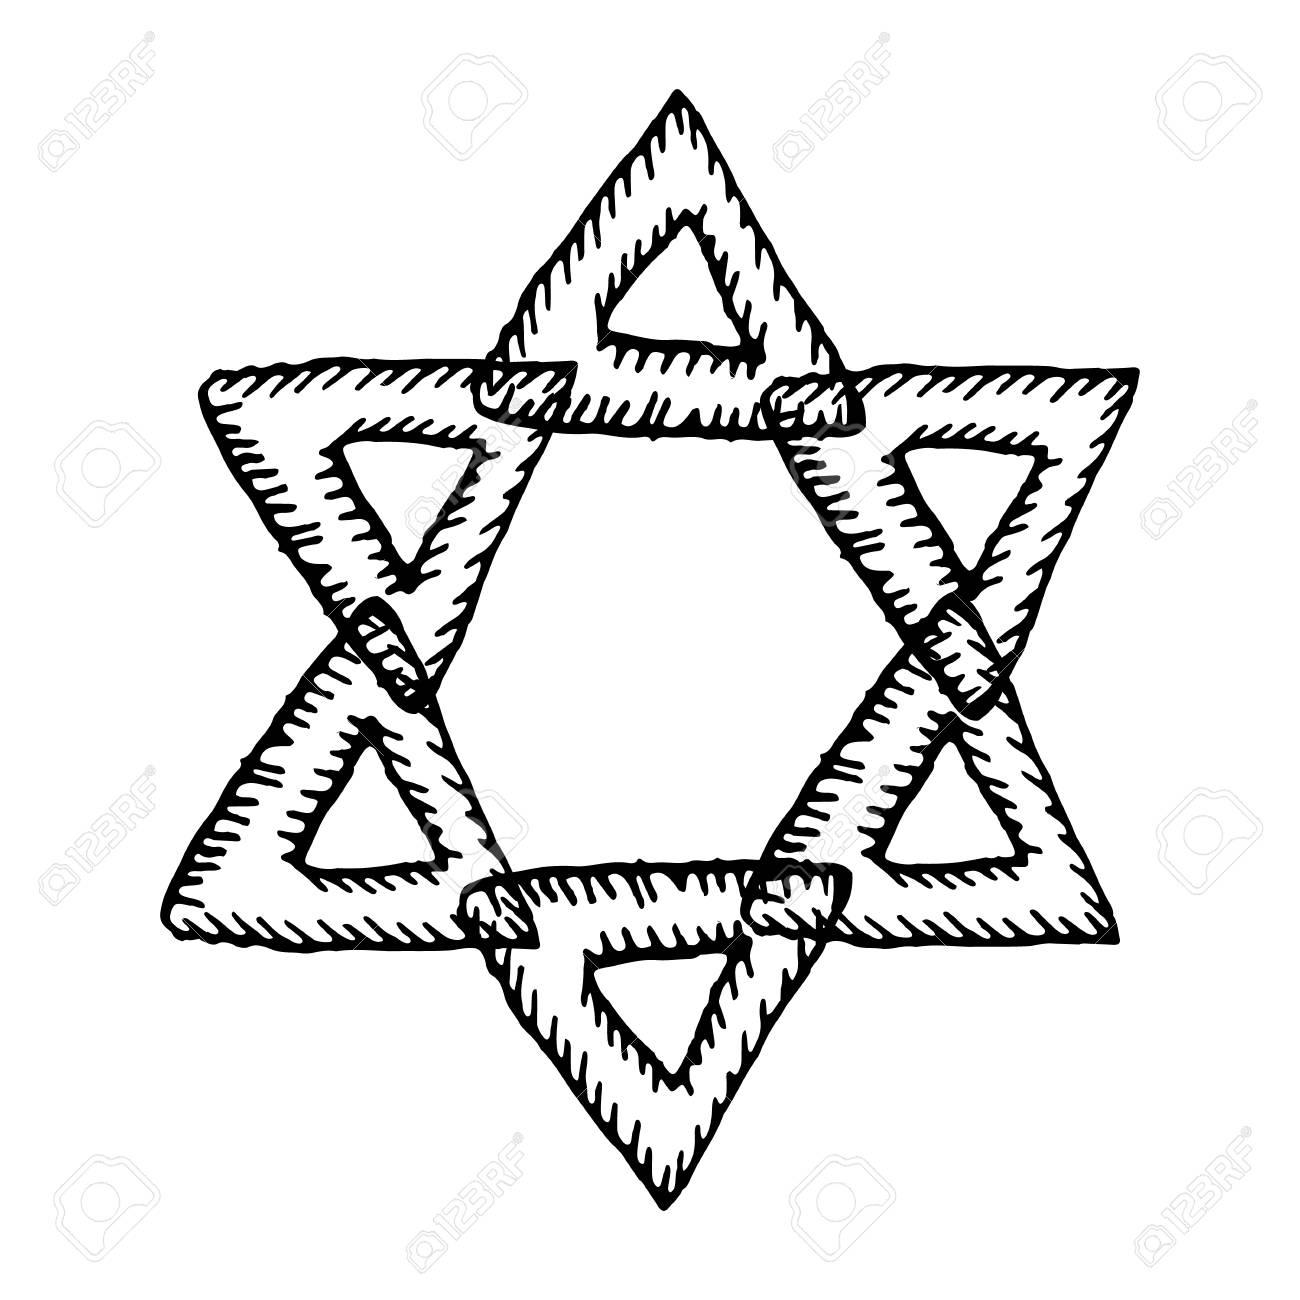 Jewish Drawing At Getdrawings Free For Personal Use Jewish